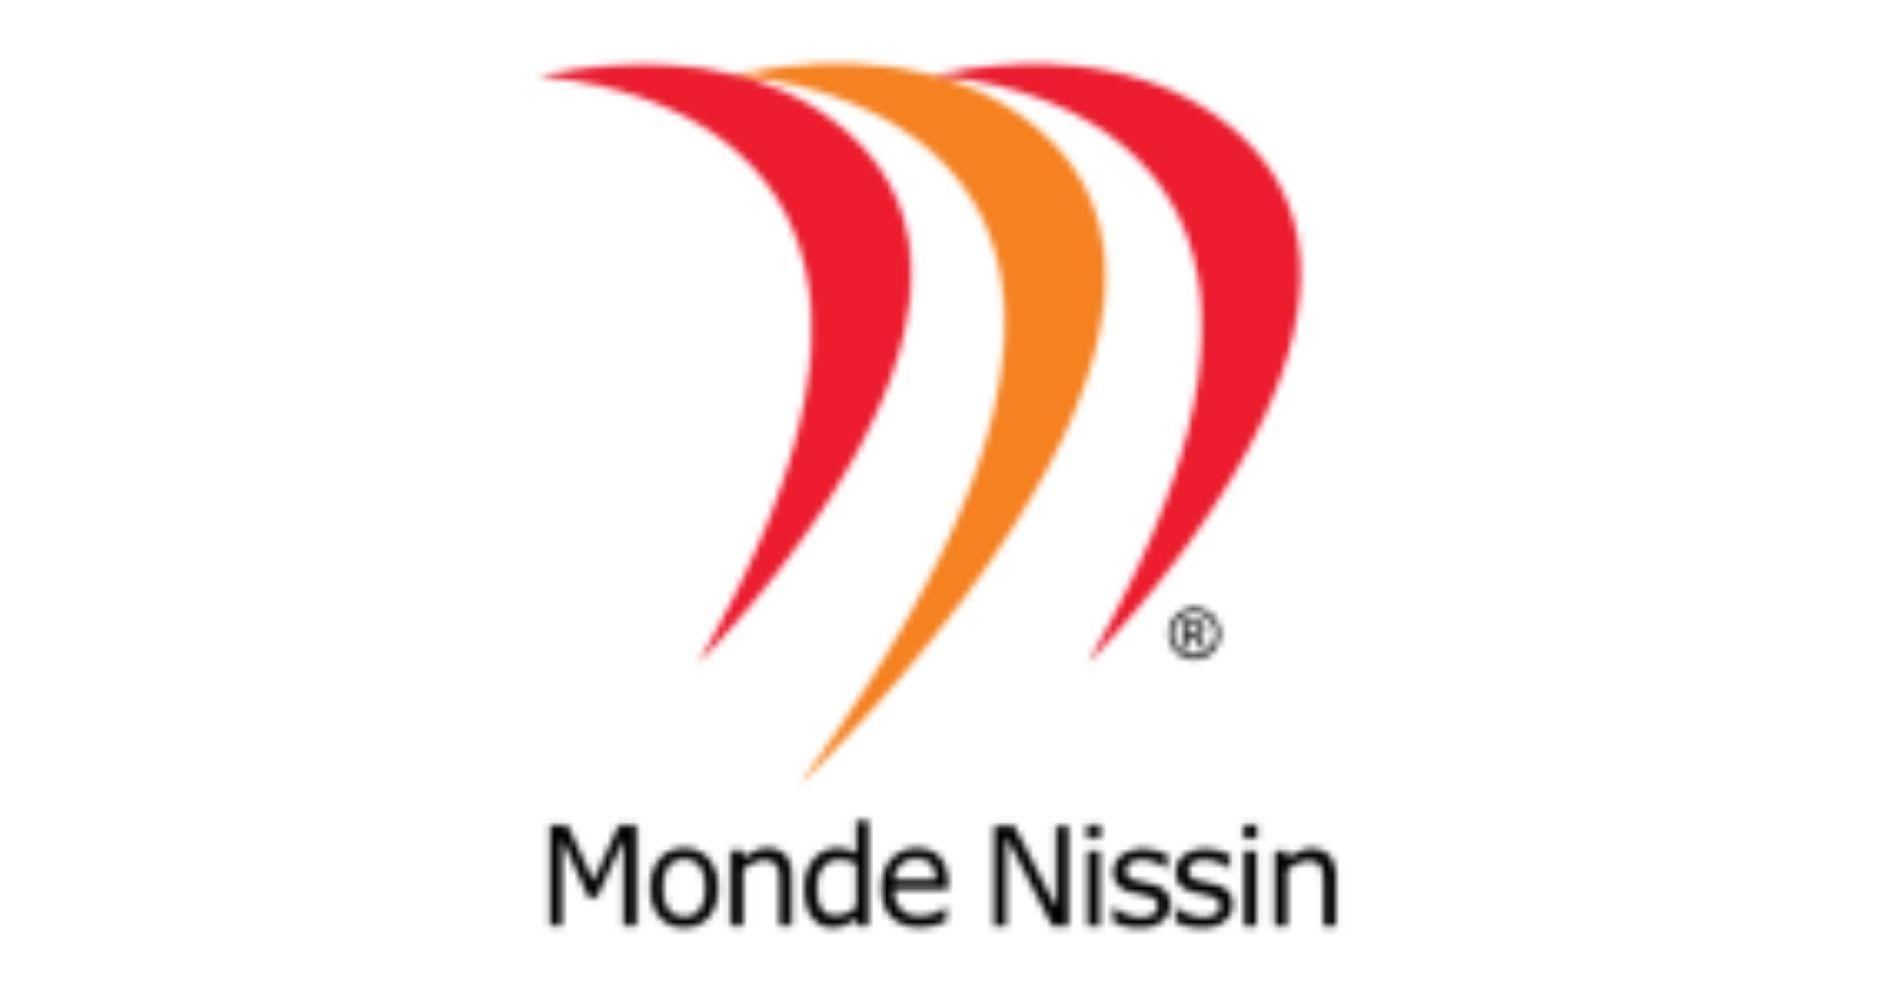 Monde Nissin IPO Illustration Web Bisnis Muda - Image: Monde Nissin